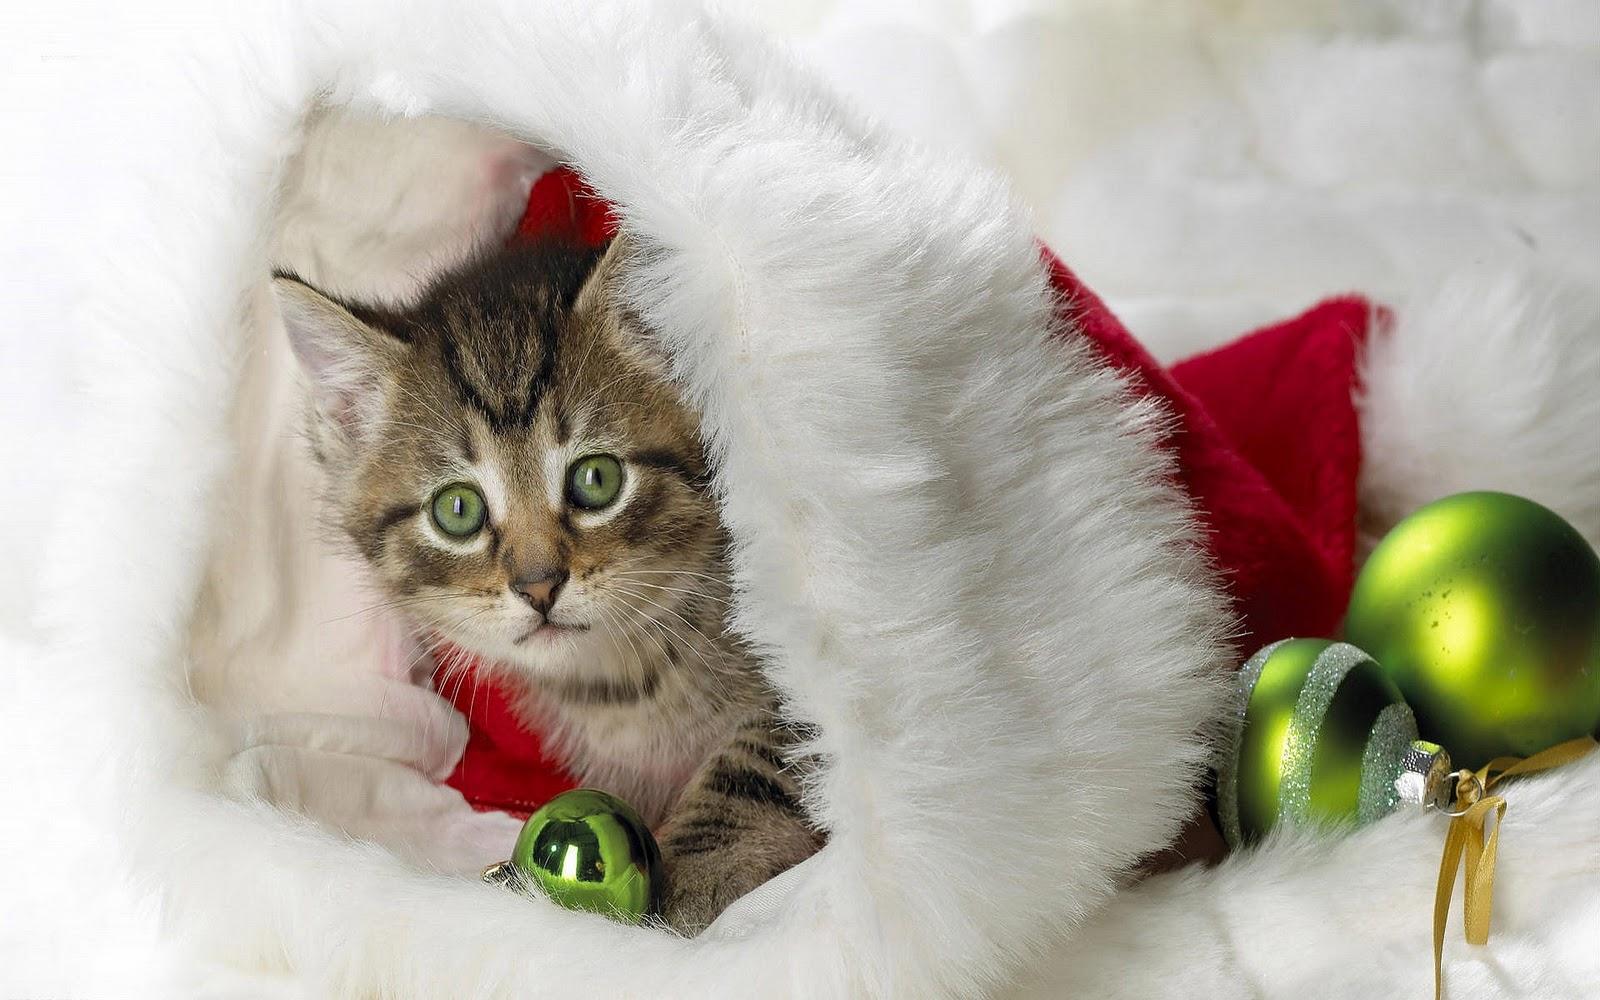 Kitten Achtergronden | HD Wallpapers